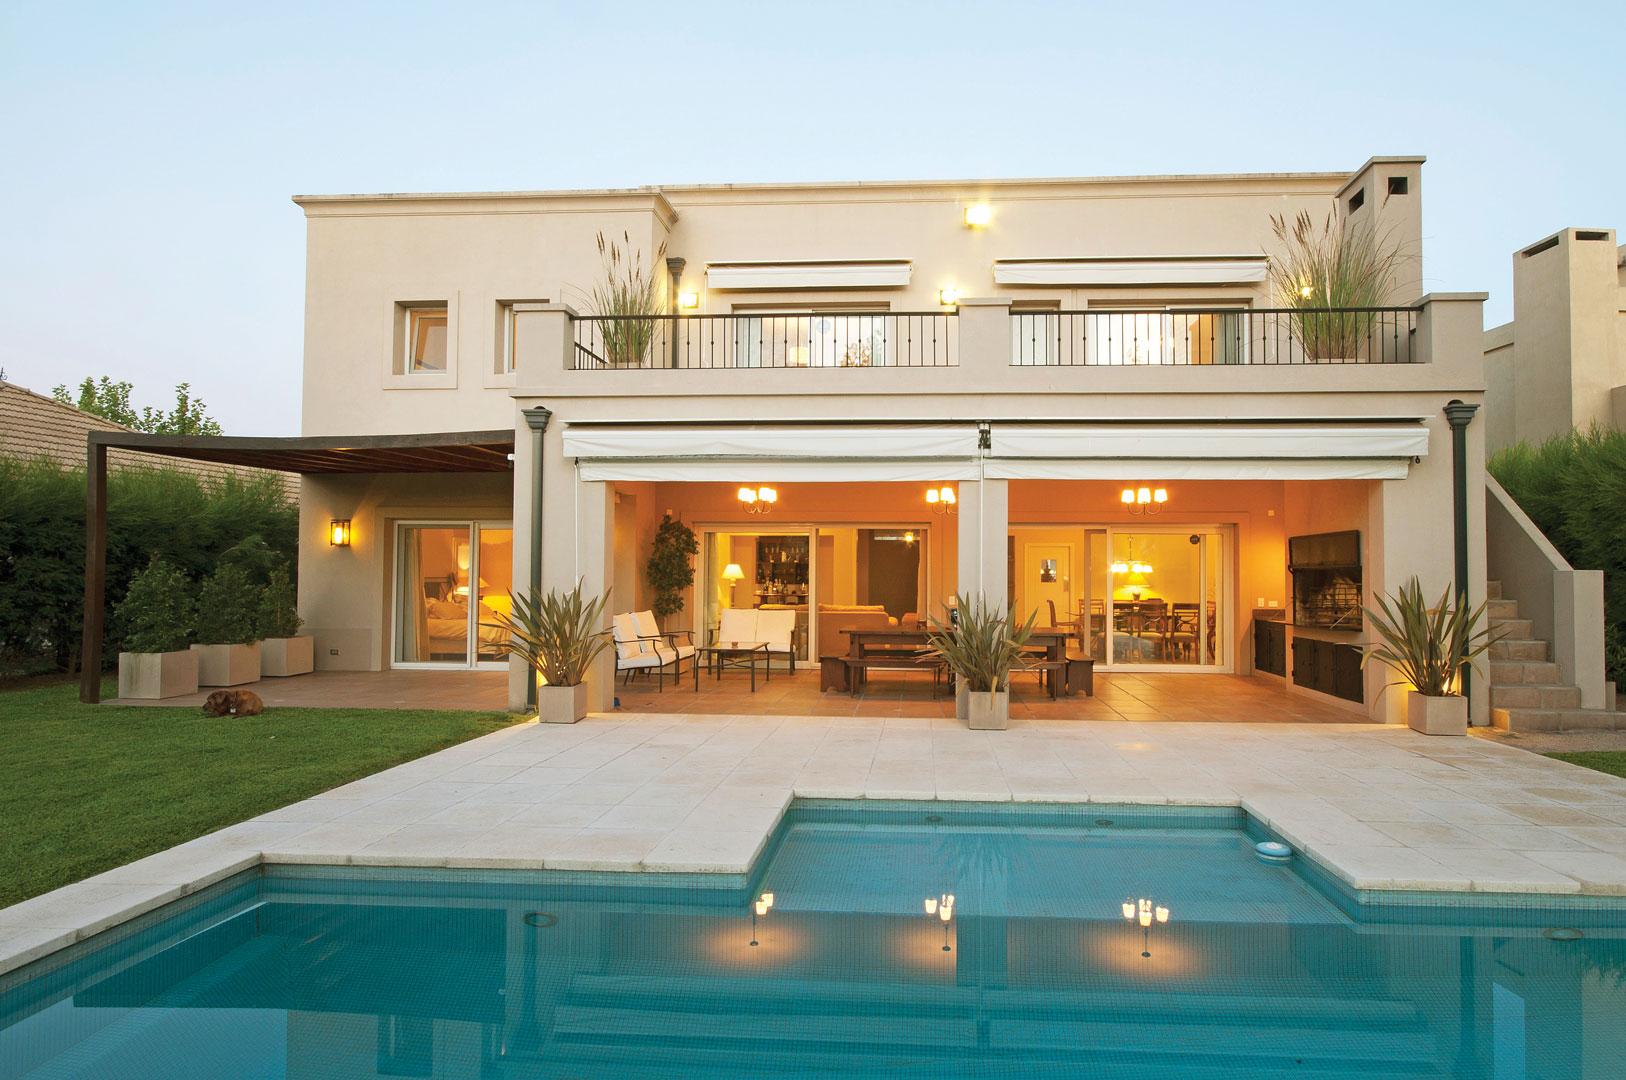 Estudio clari arquitectura casa estilo actual portal for Casa de arquitectos